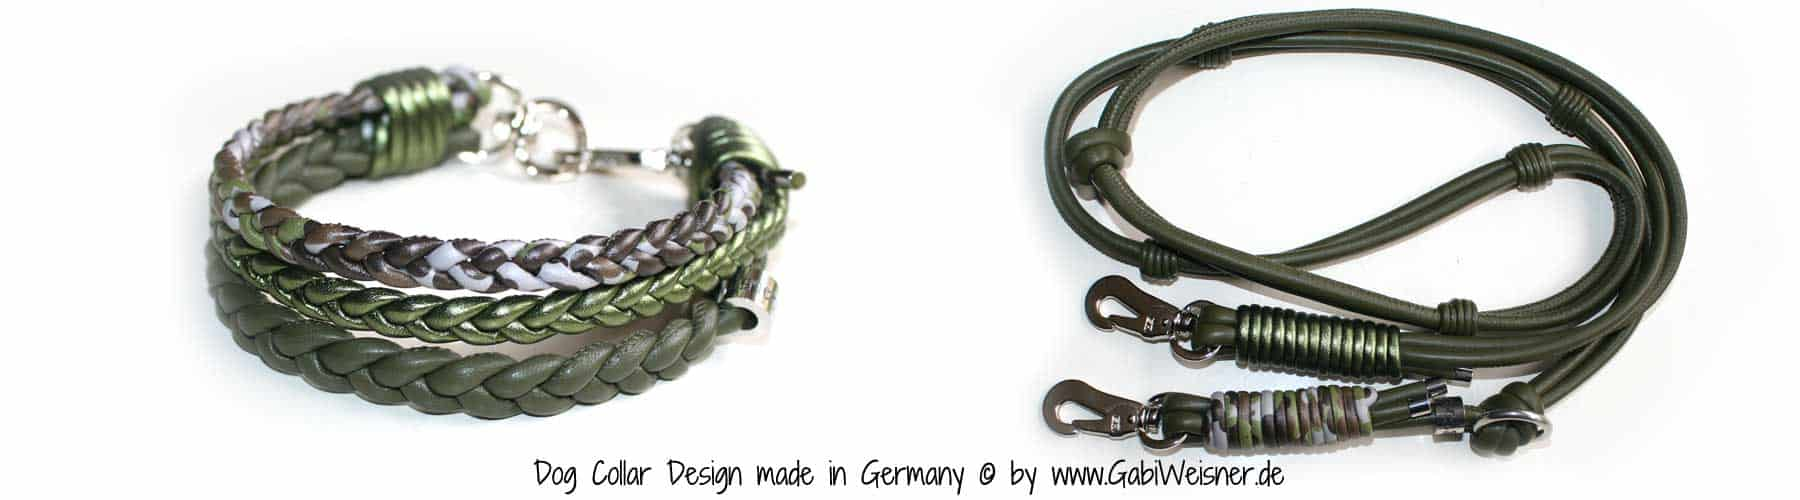 Hundeleine Leder Camouflage und Moos